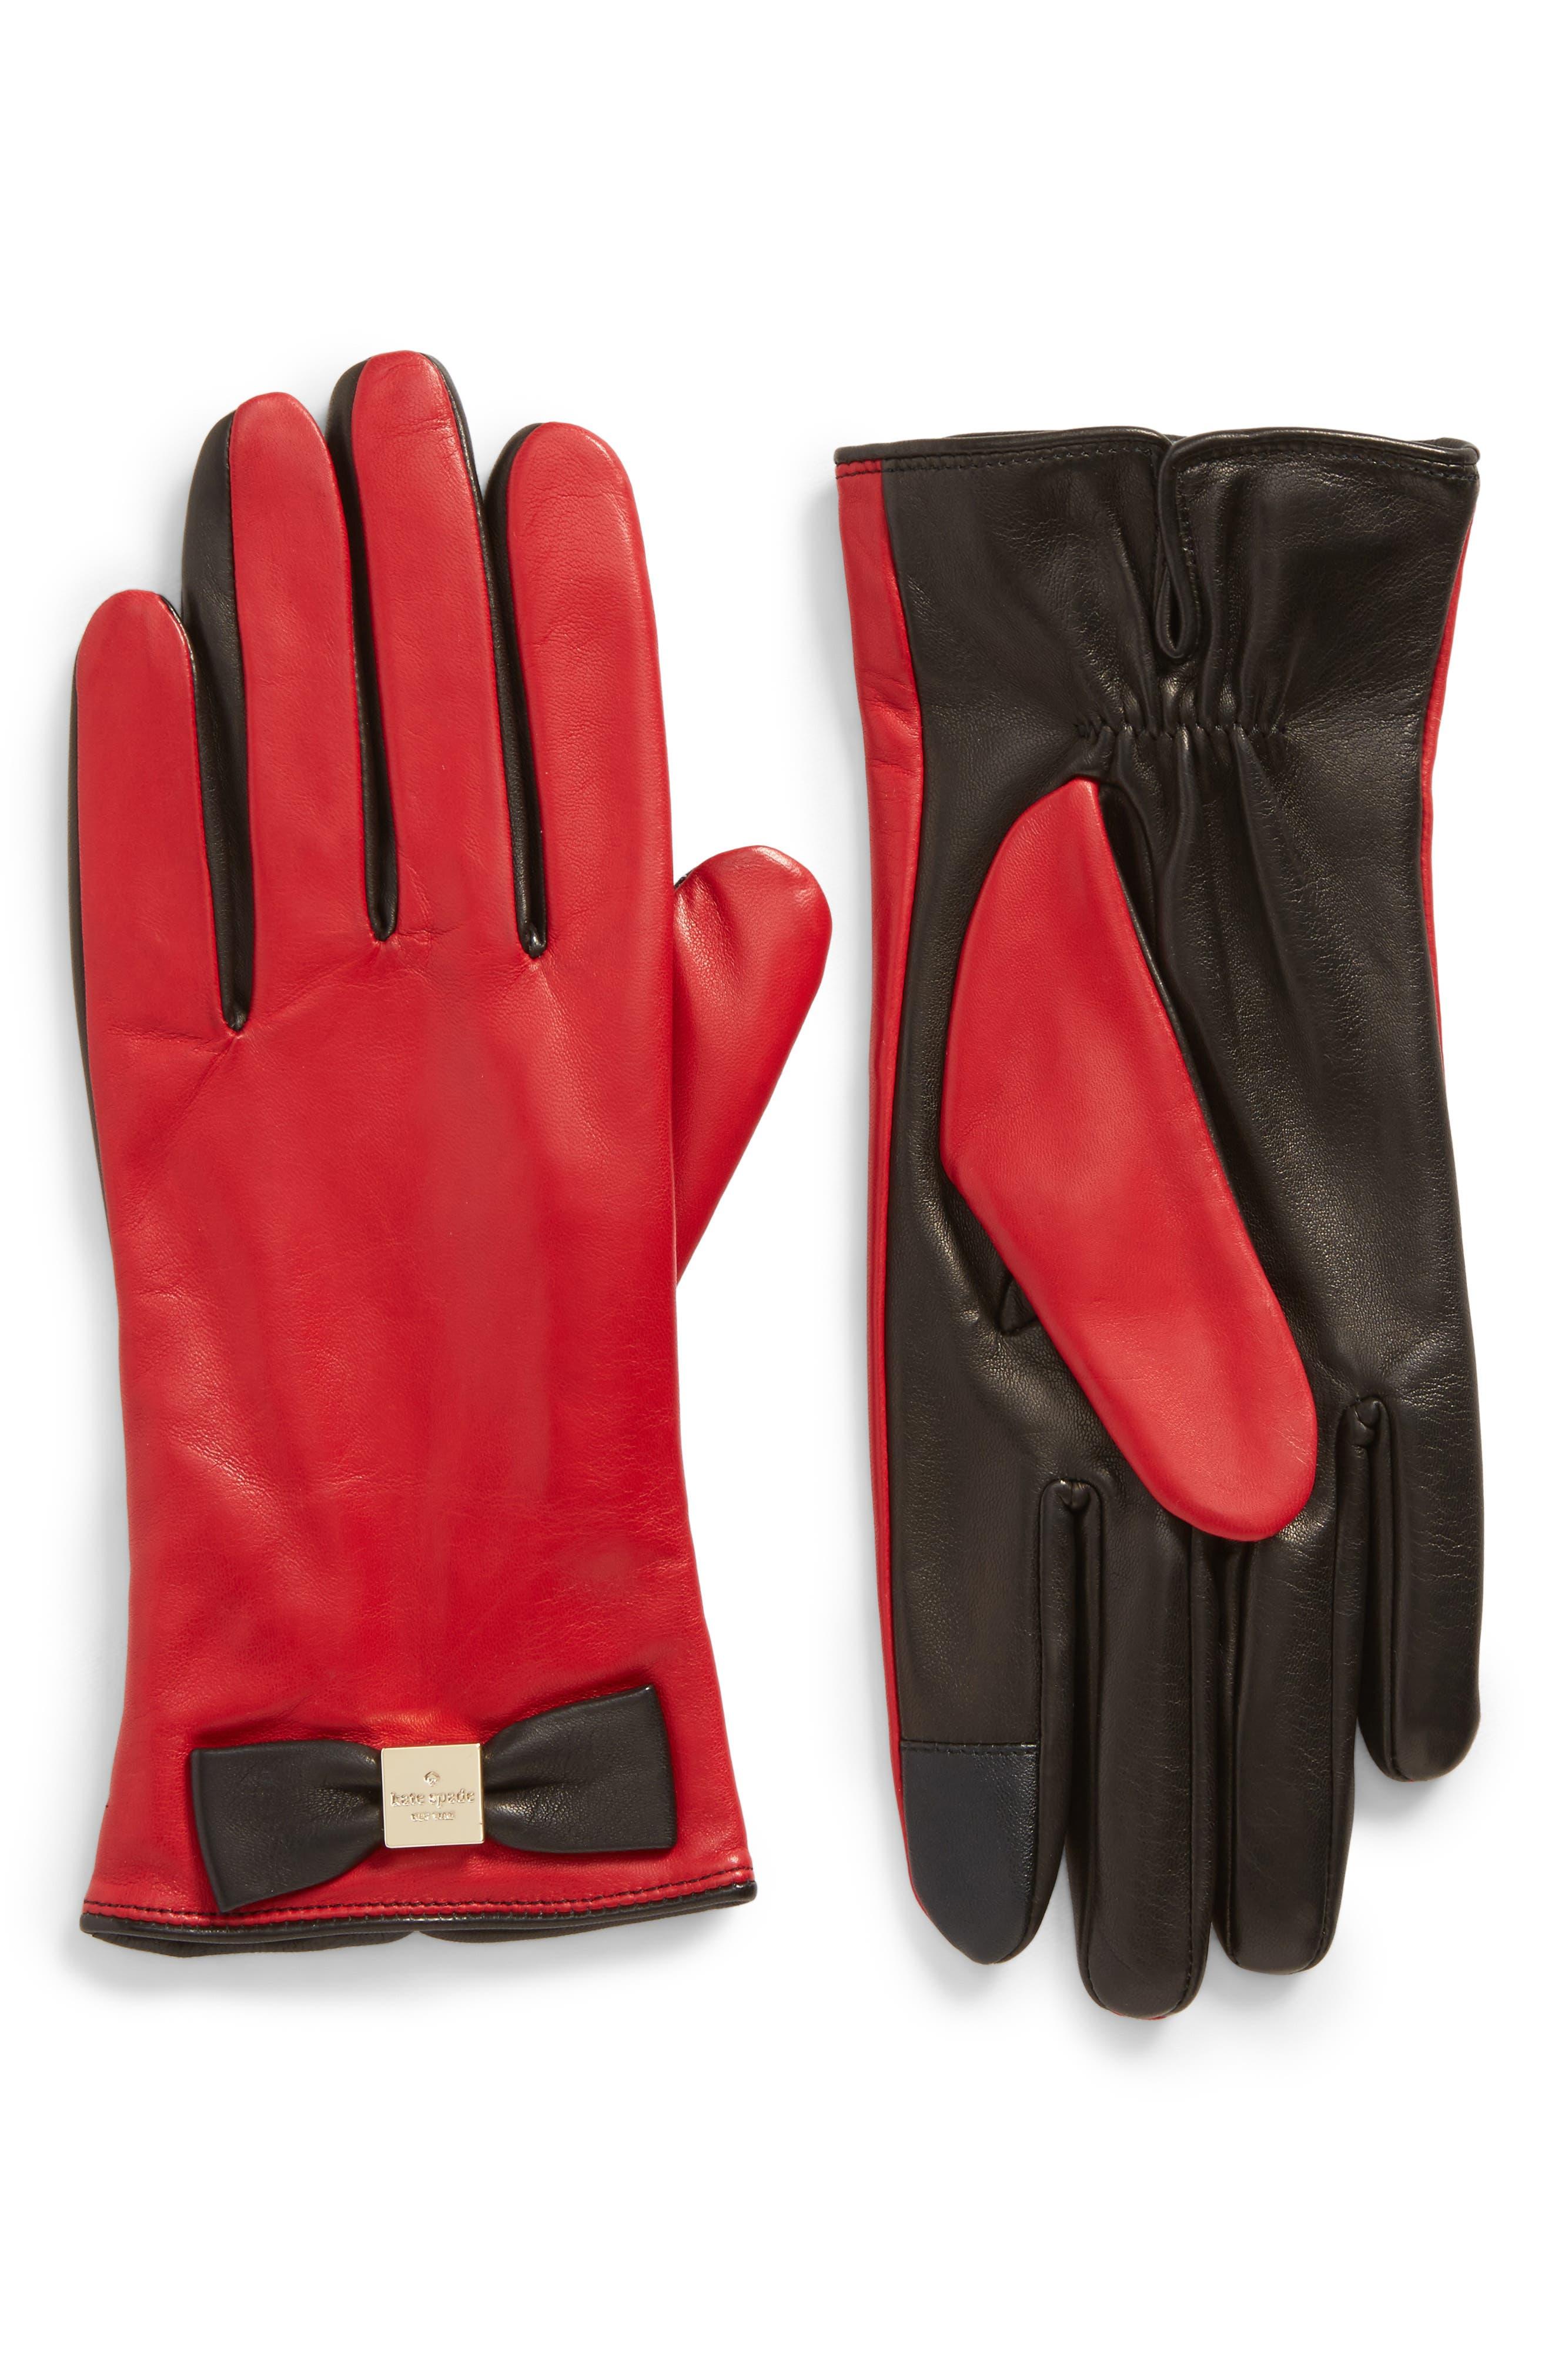 katespade new york'bow logo' gloves